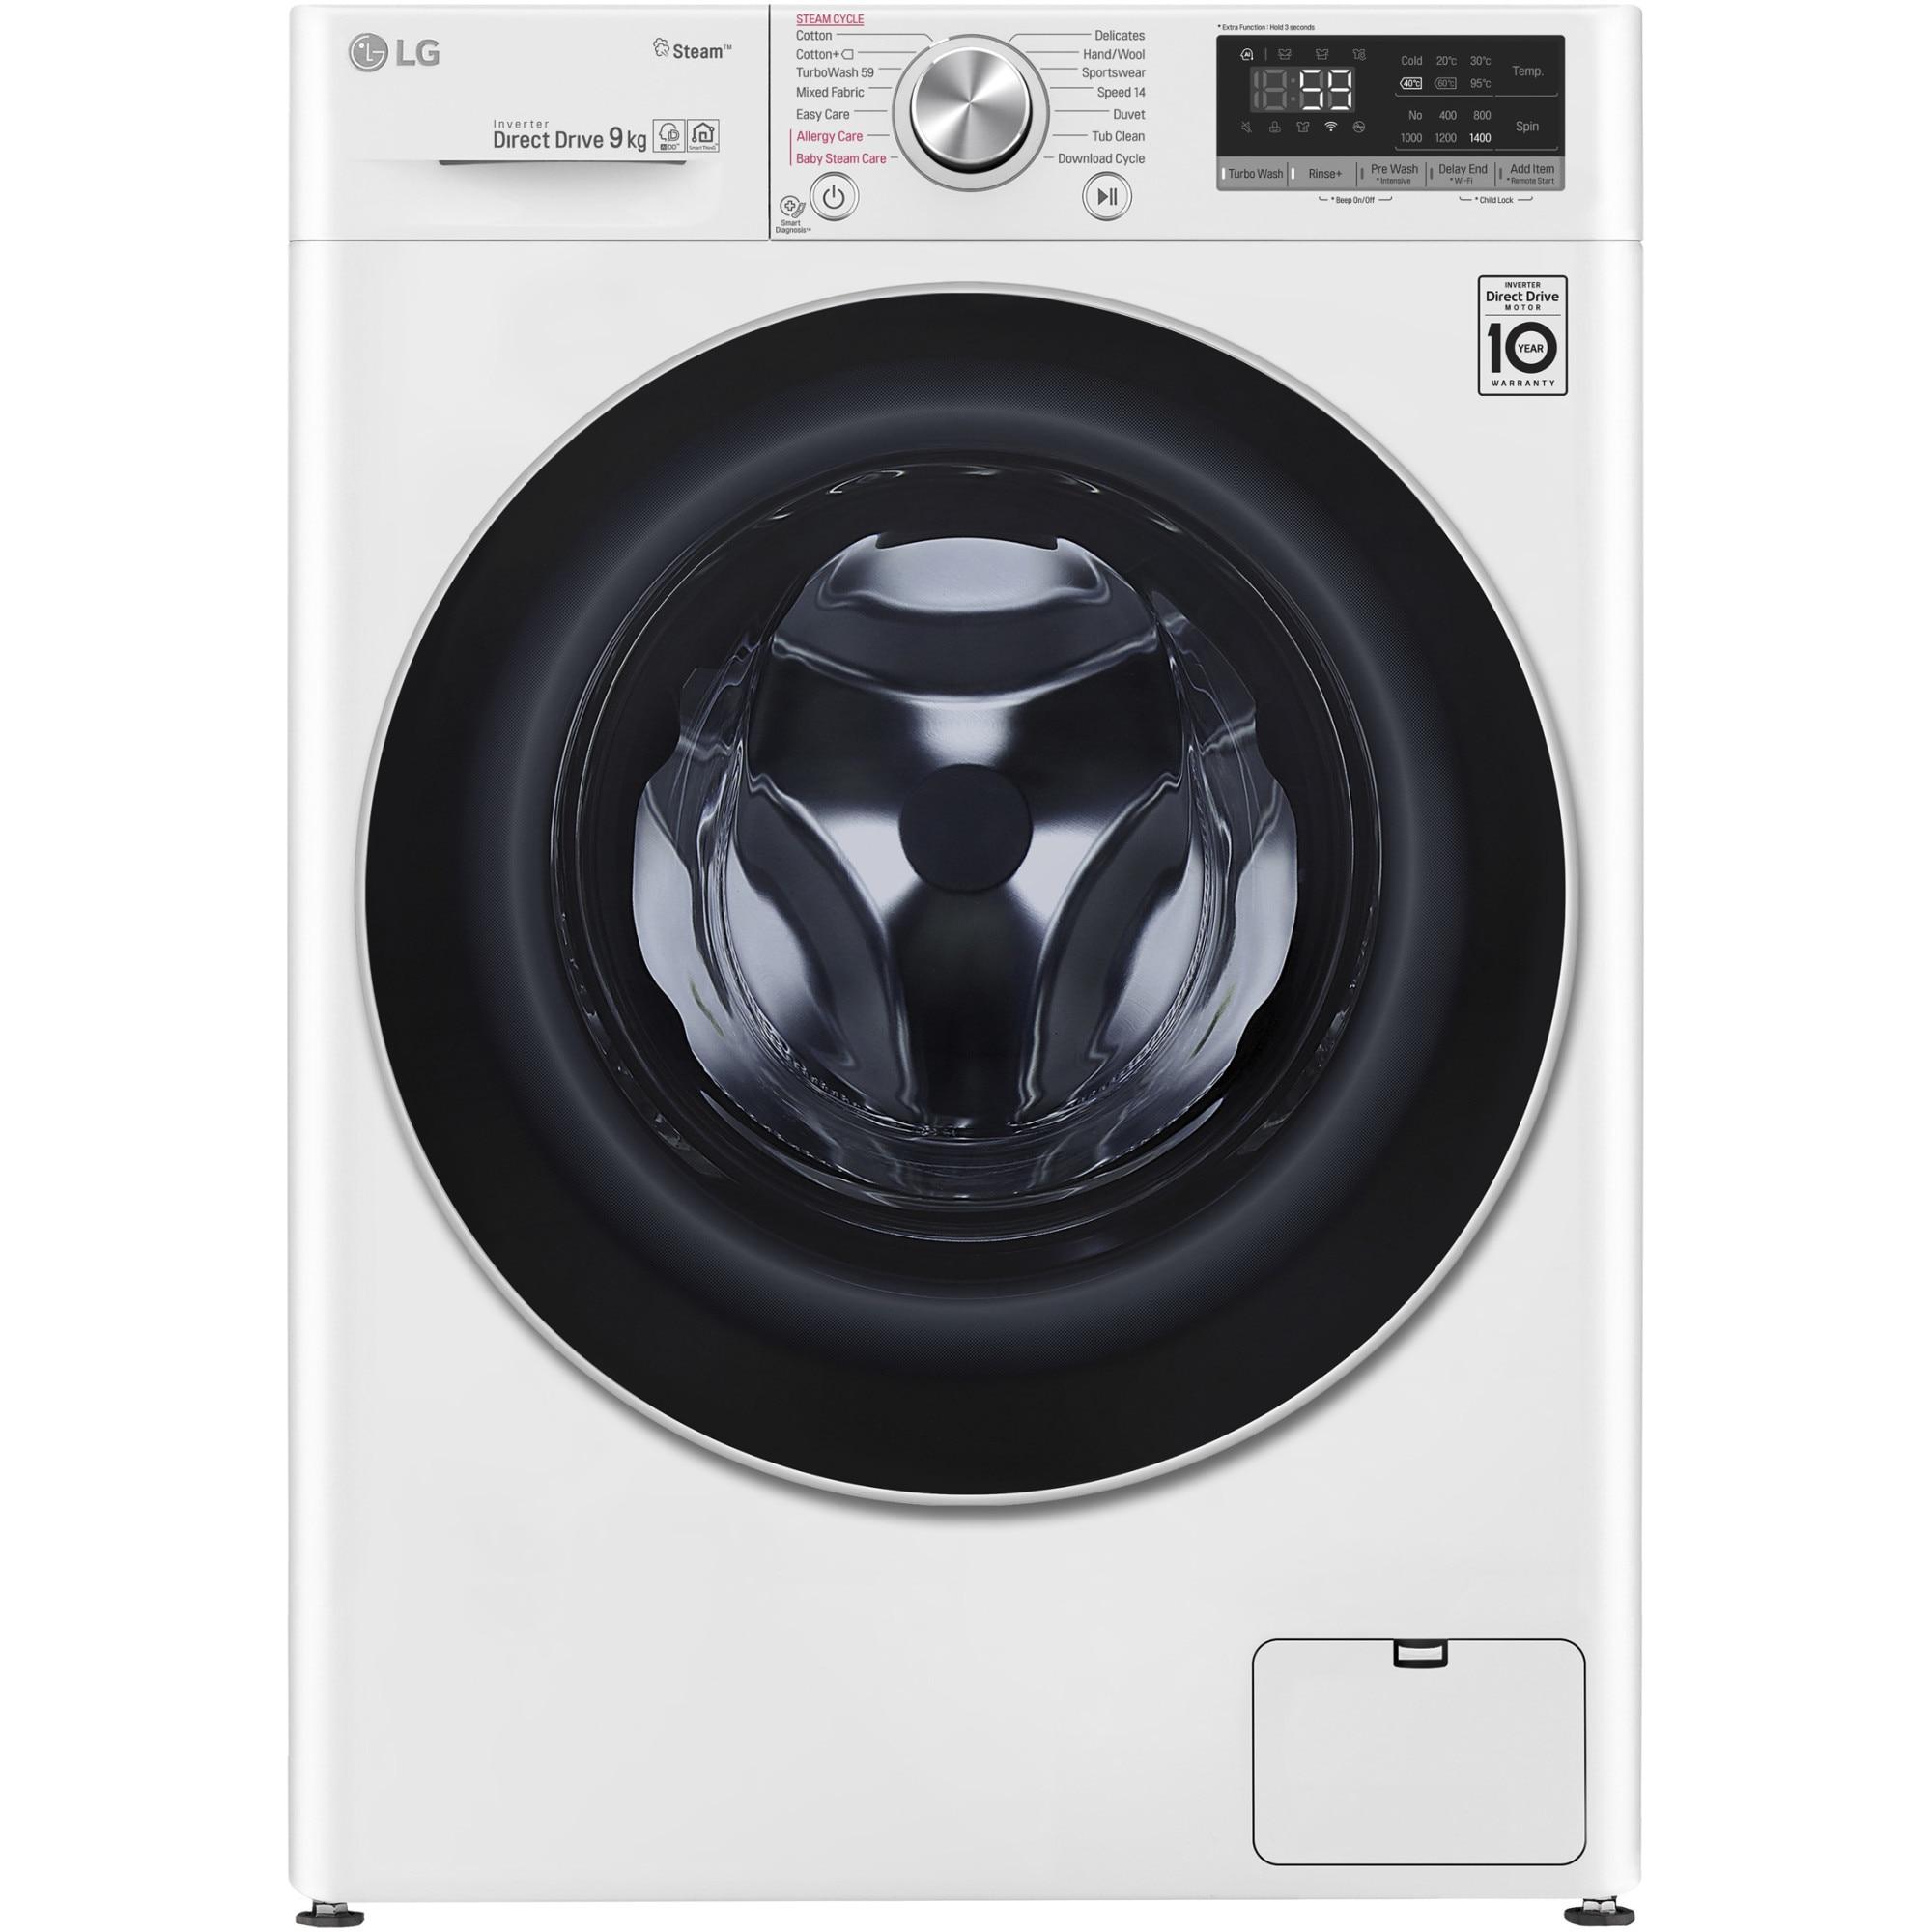 Fotografie Masina de spalat rufe LG F4WN609S1, 9 kg, 1400 RPM, Clasa D, Direct Drive, Turbo Wash, Steam, Smart Diagnoisis, WiFi, Alb